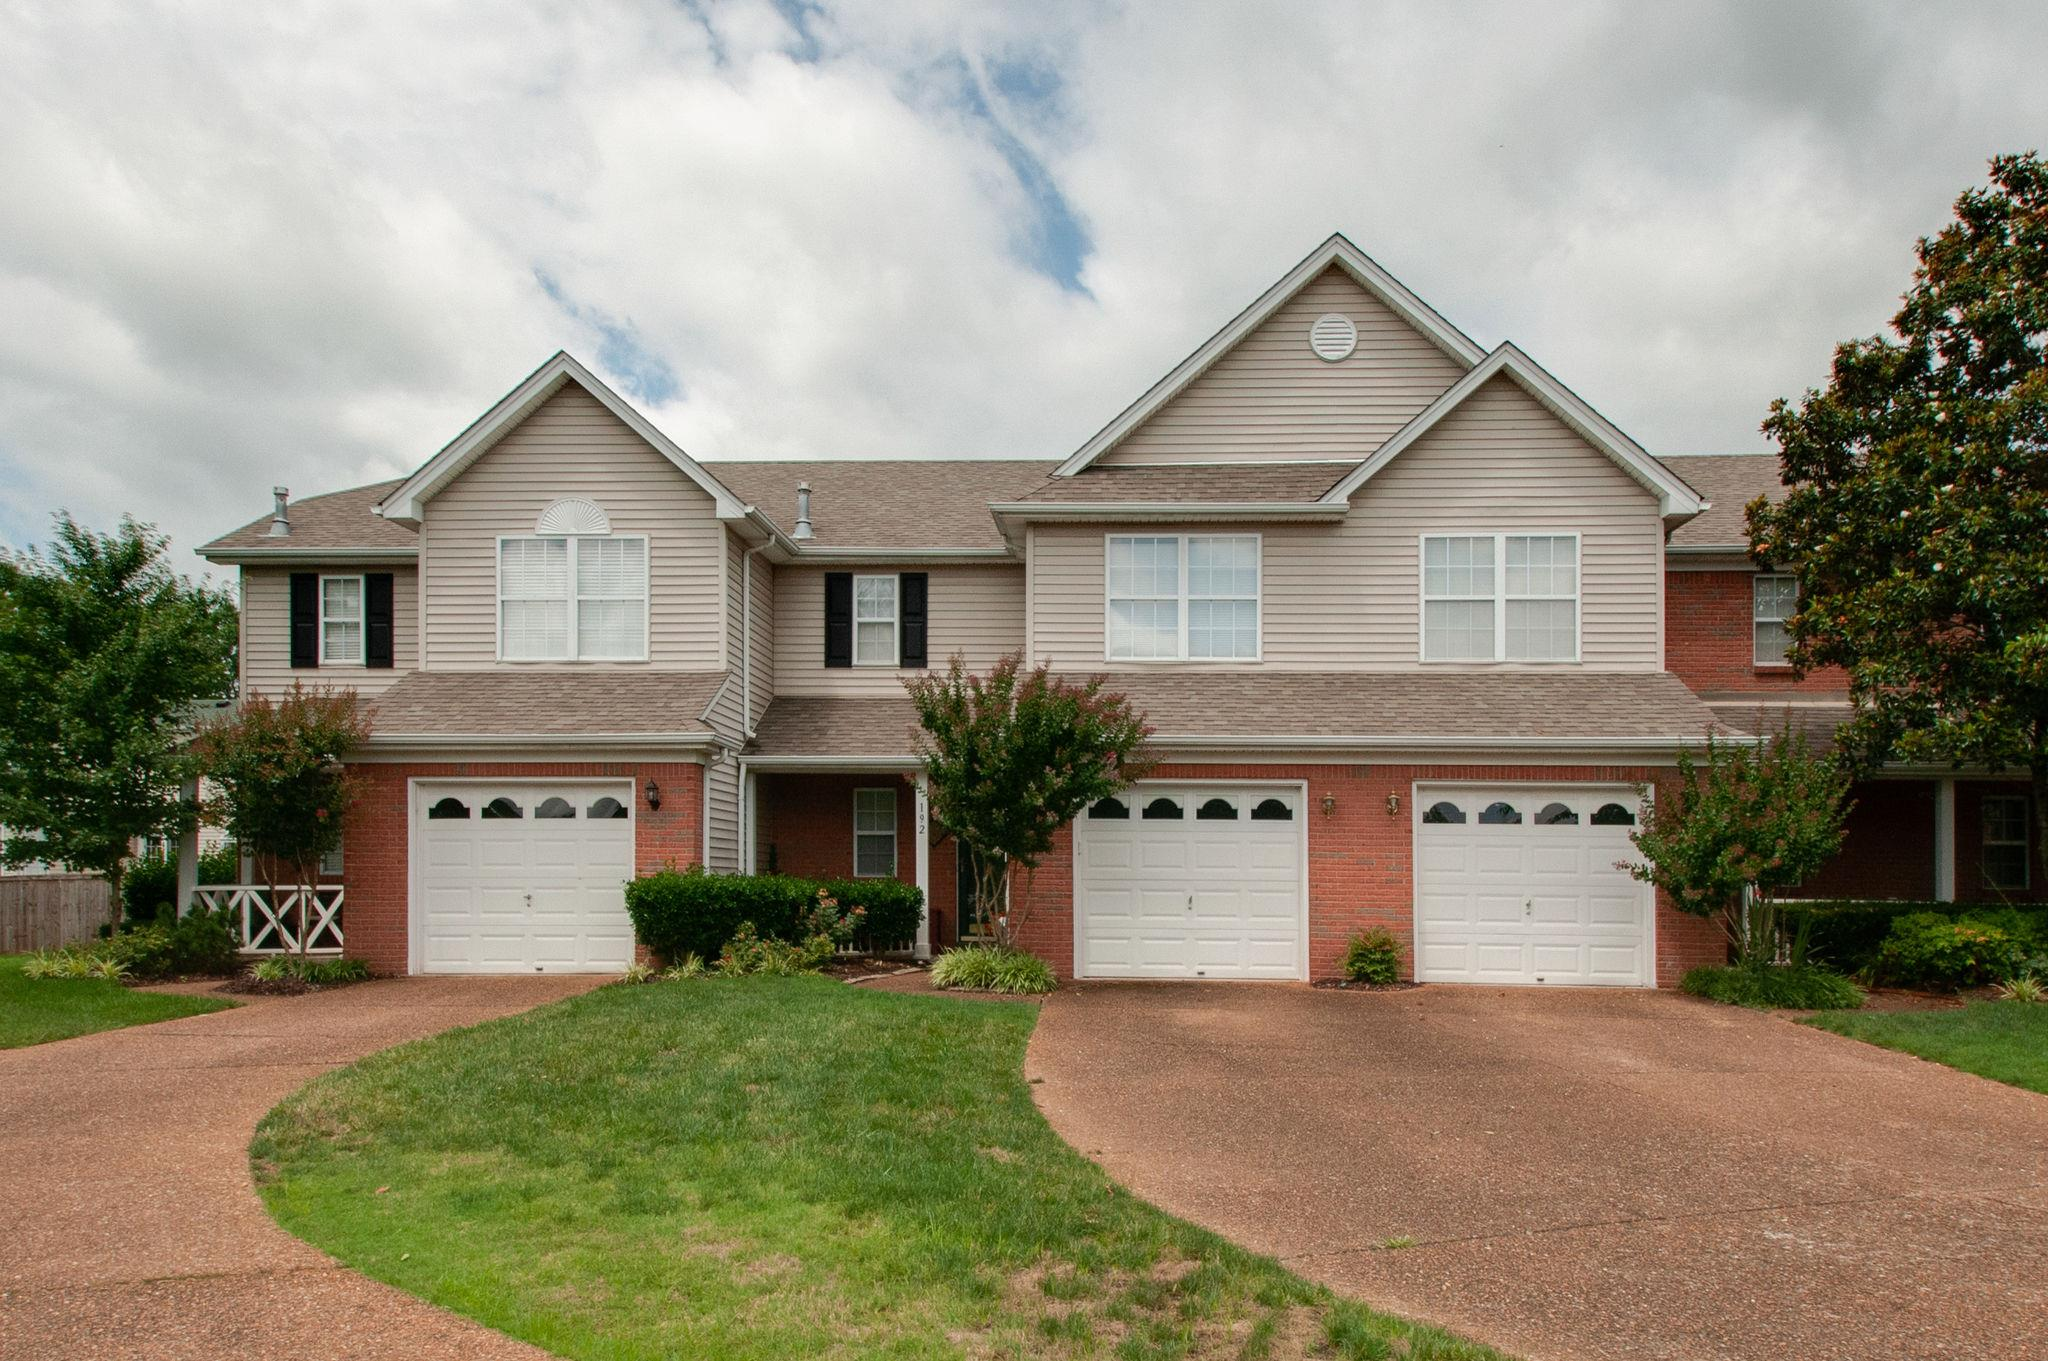 192 Stanton Hall Lane, Franklin, TN 37069 - Franklin, TN real estate listing